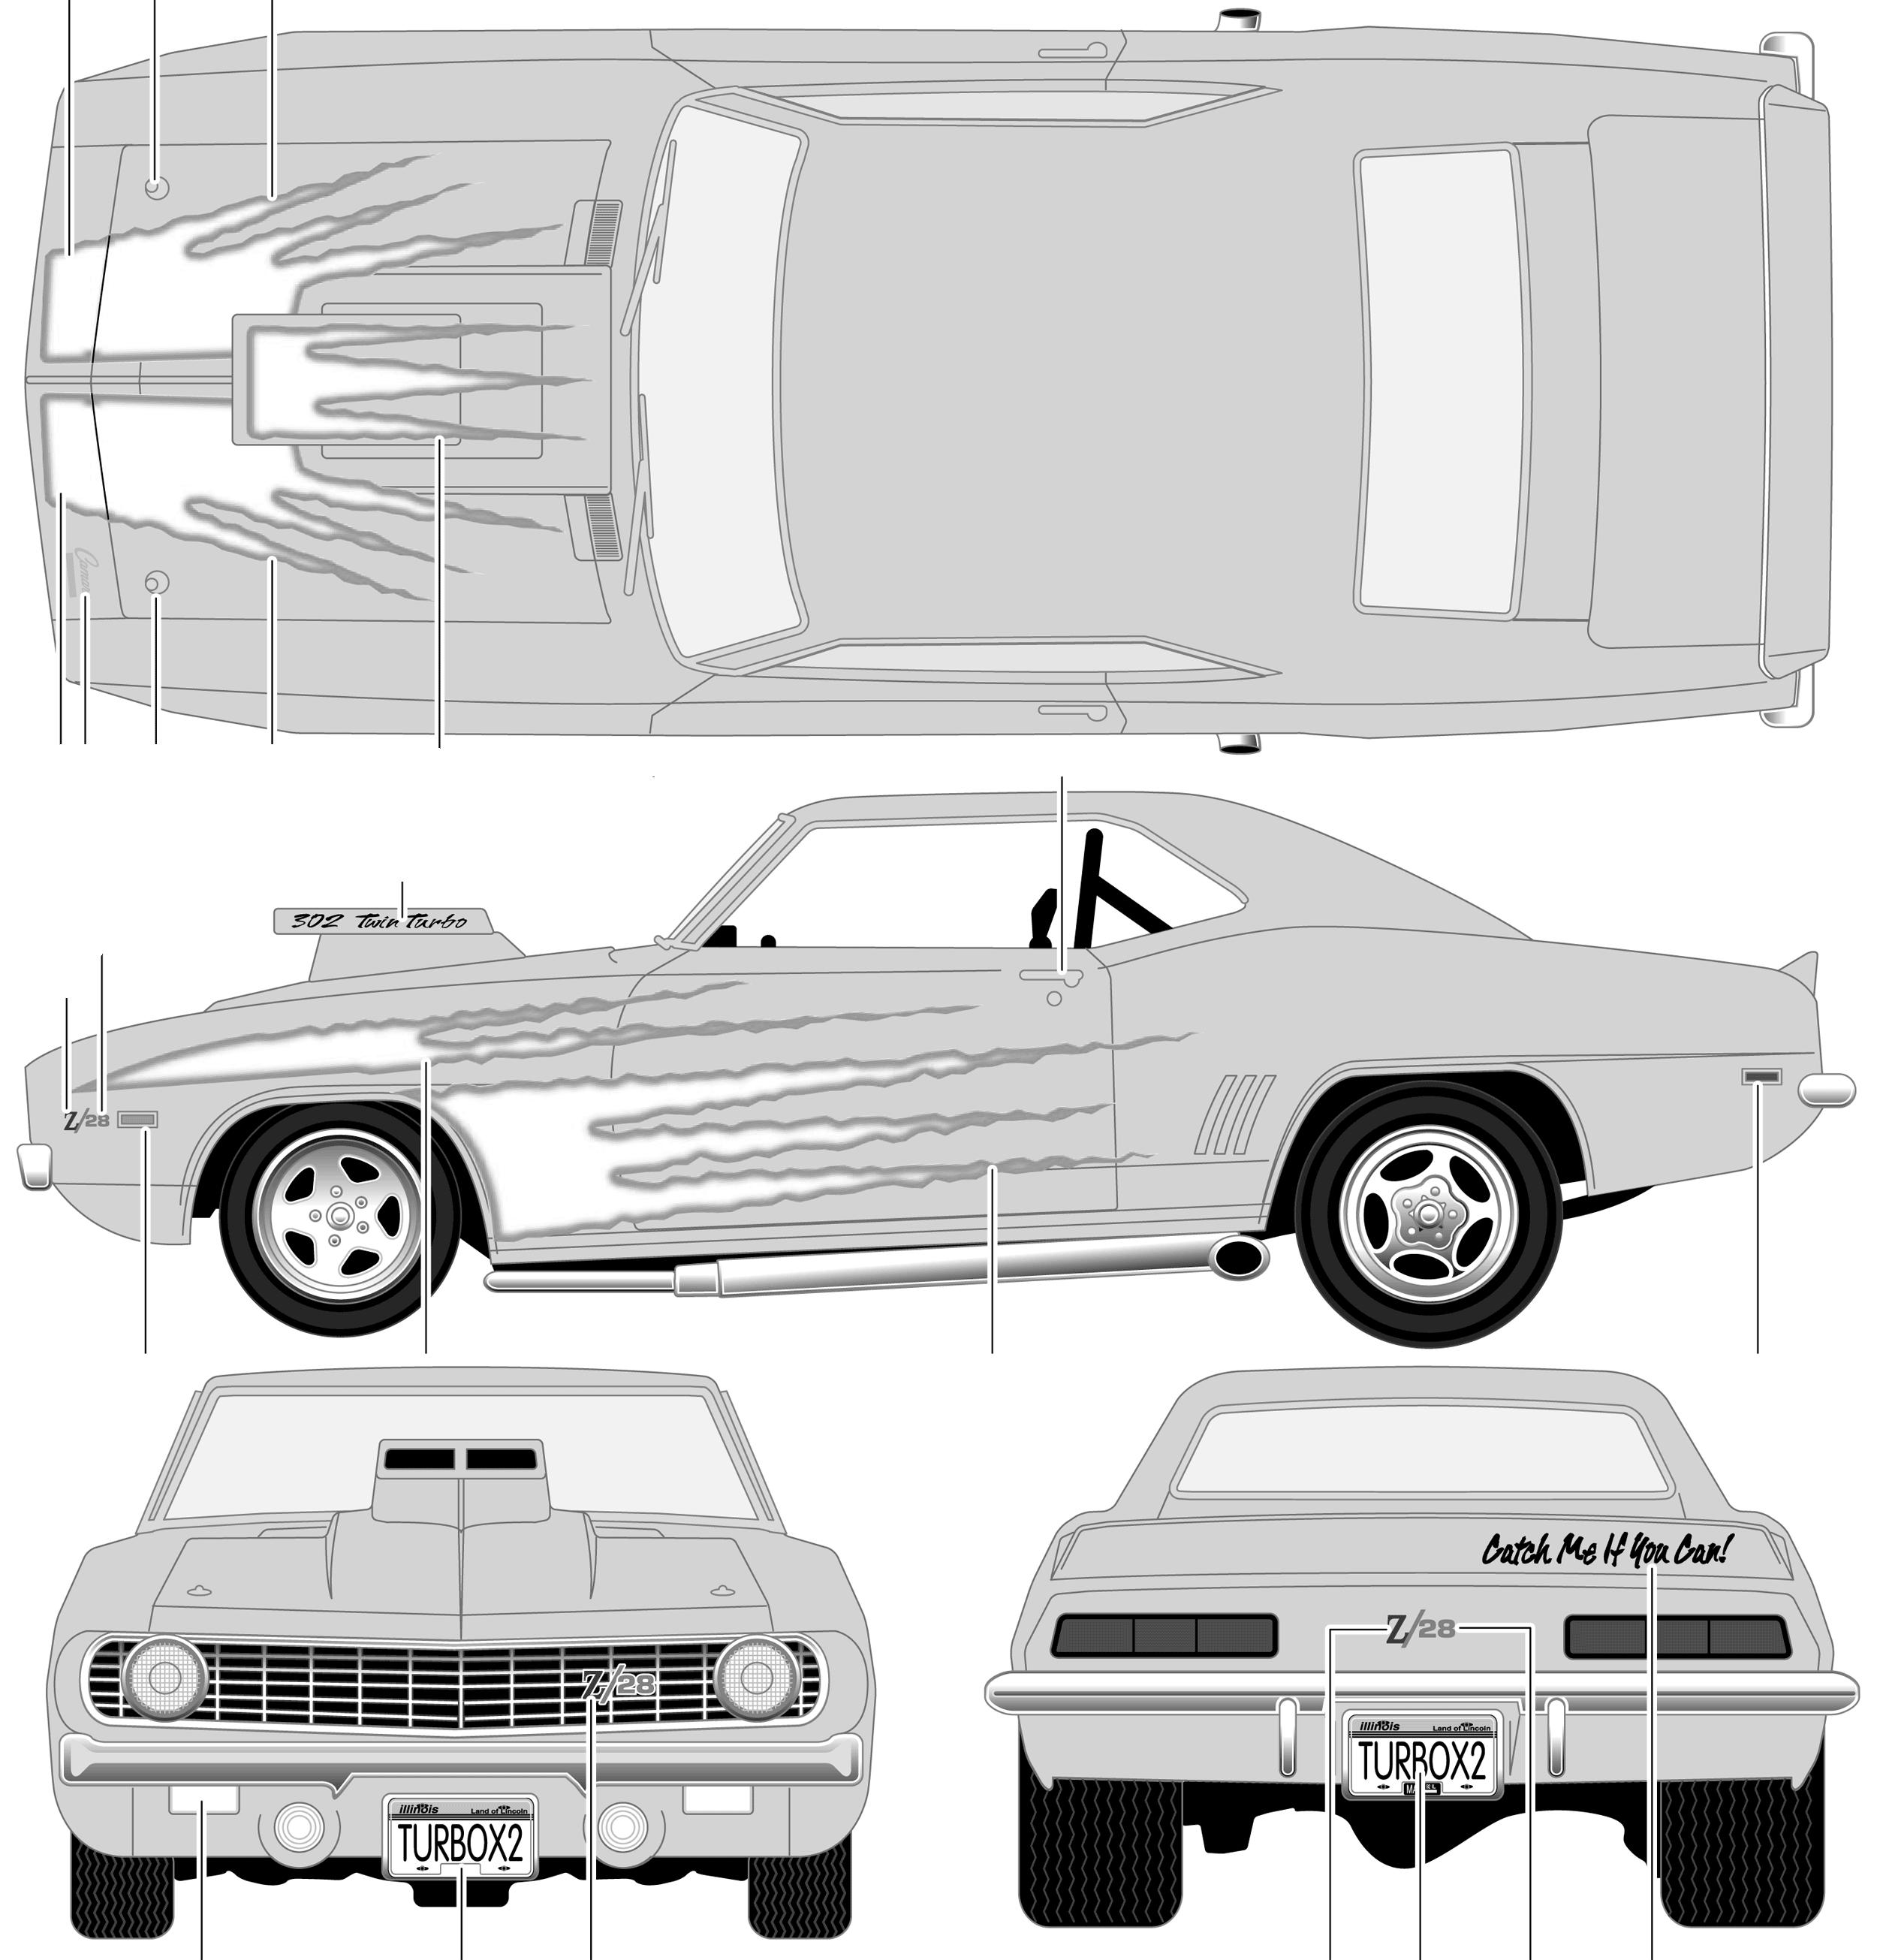 1969 Chevrolet Camaro Z-28 Motorworks Coupe blueprints ...